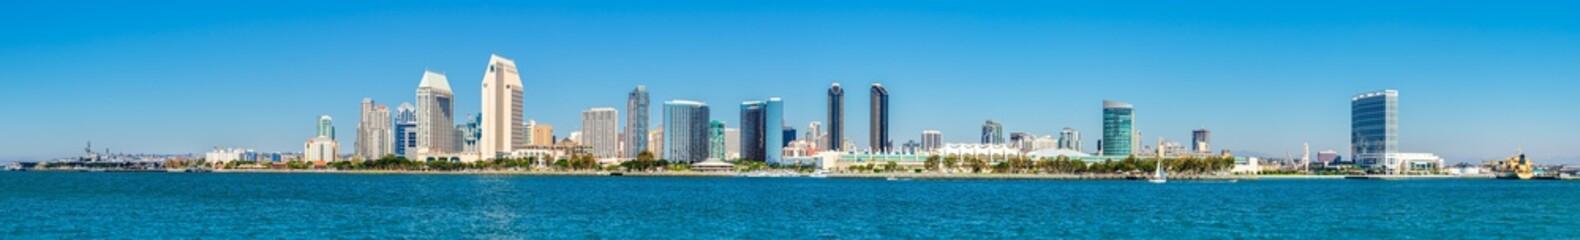 Panorama - Downtown San Diego